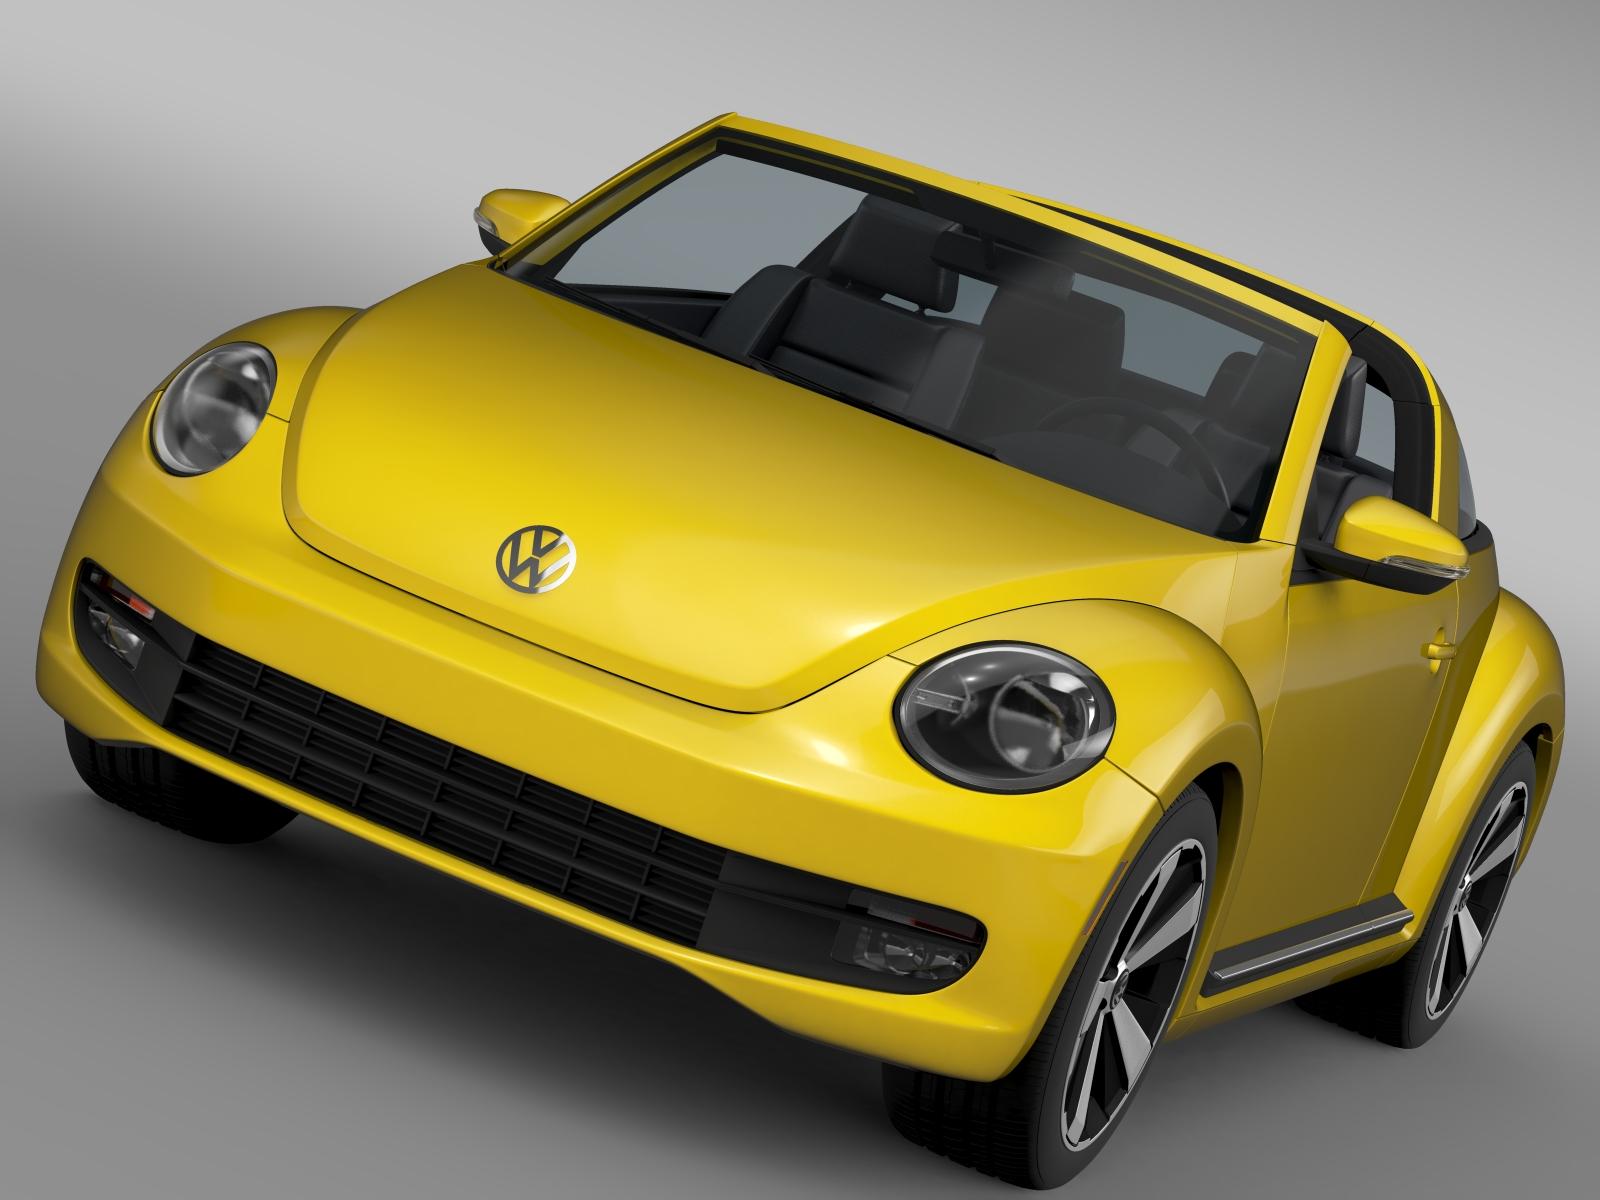 vw beetle targa 2016 3d model 3ds max fbx c4d lwo ma mb hrc xsi obj 212886